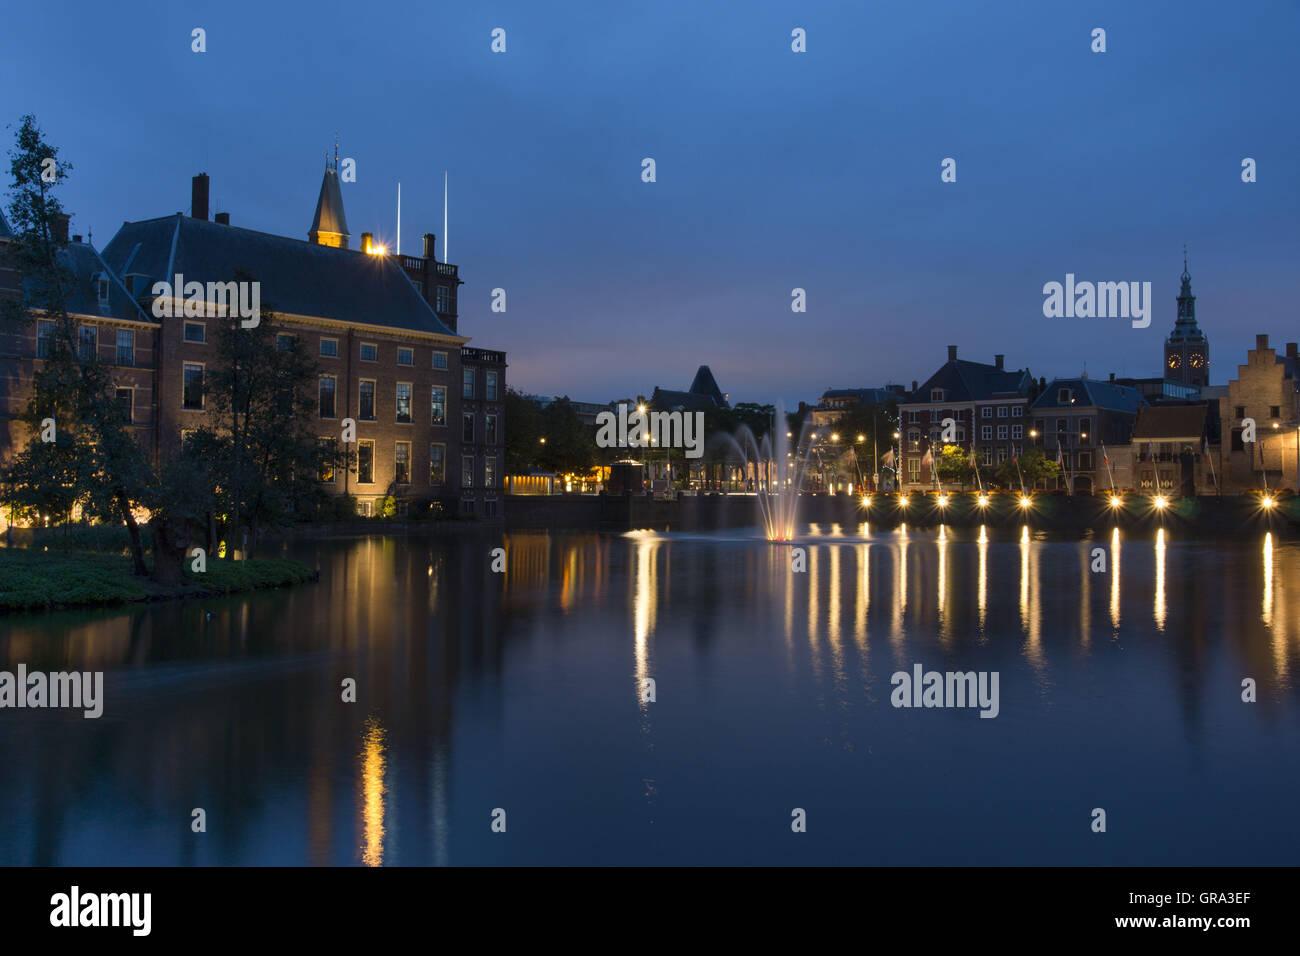 Binnenhof Inner Court Gothic Castle At Night The Hague Netherlands Europe